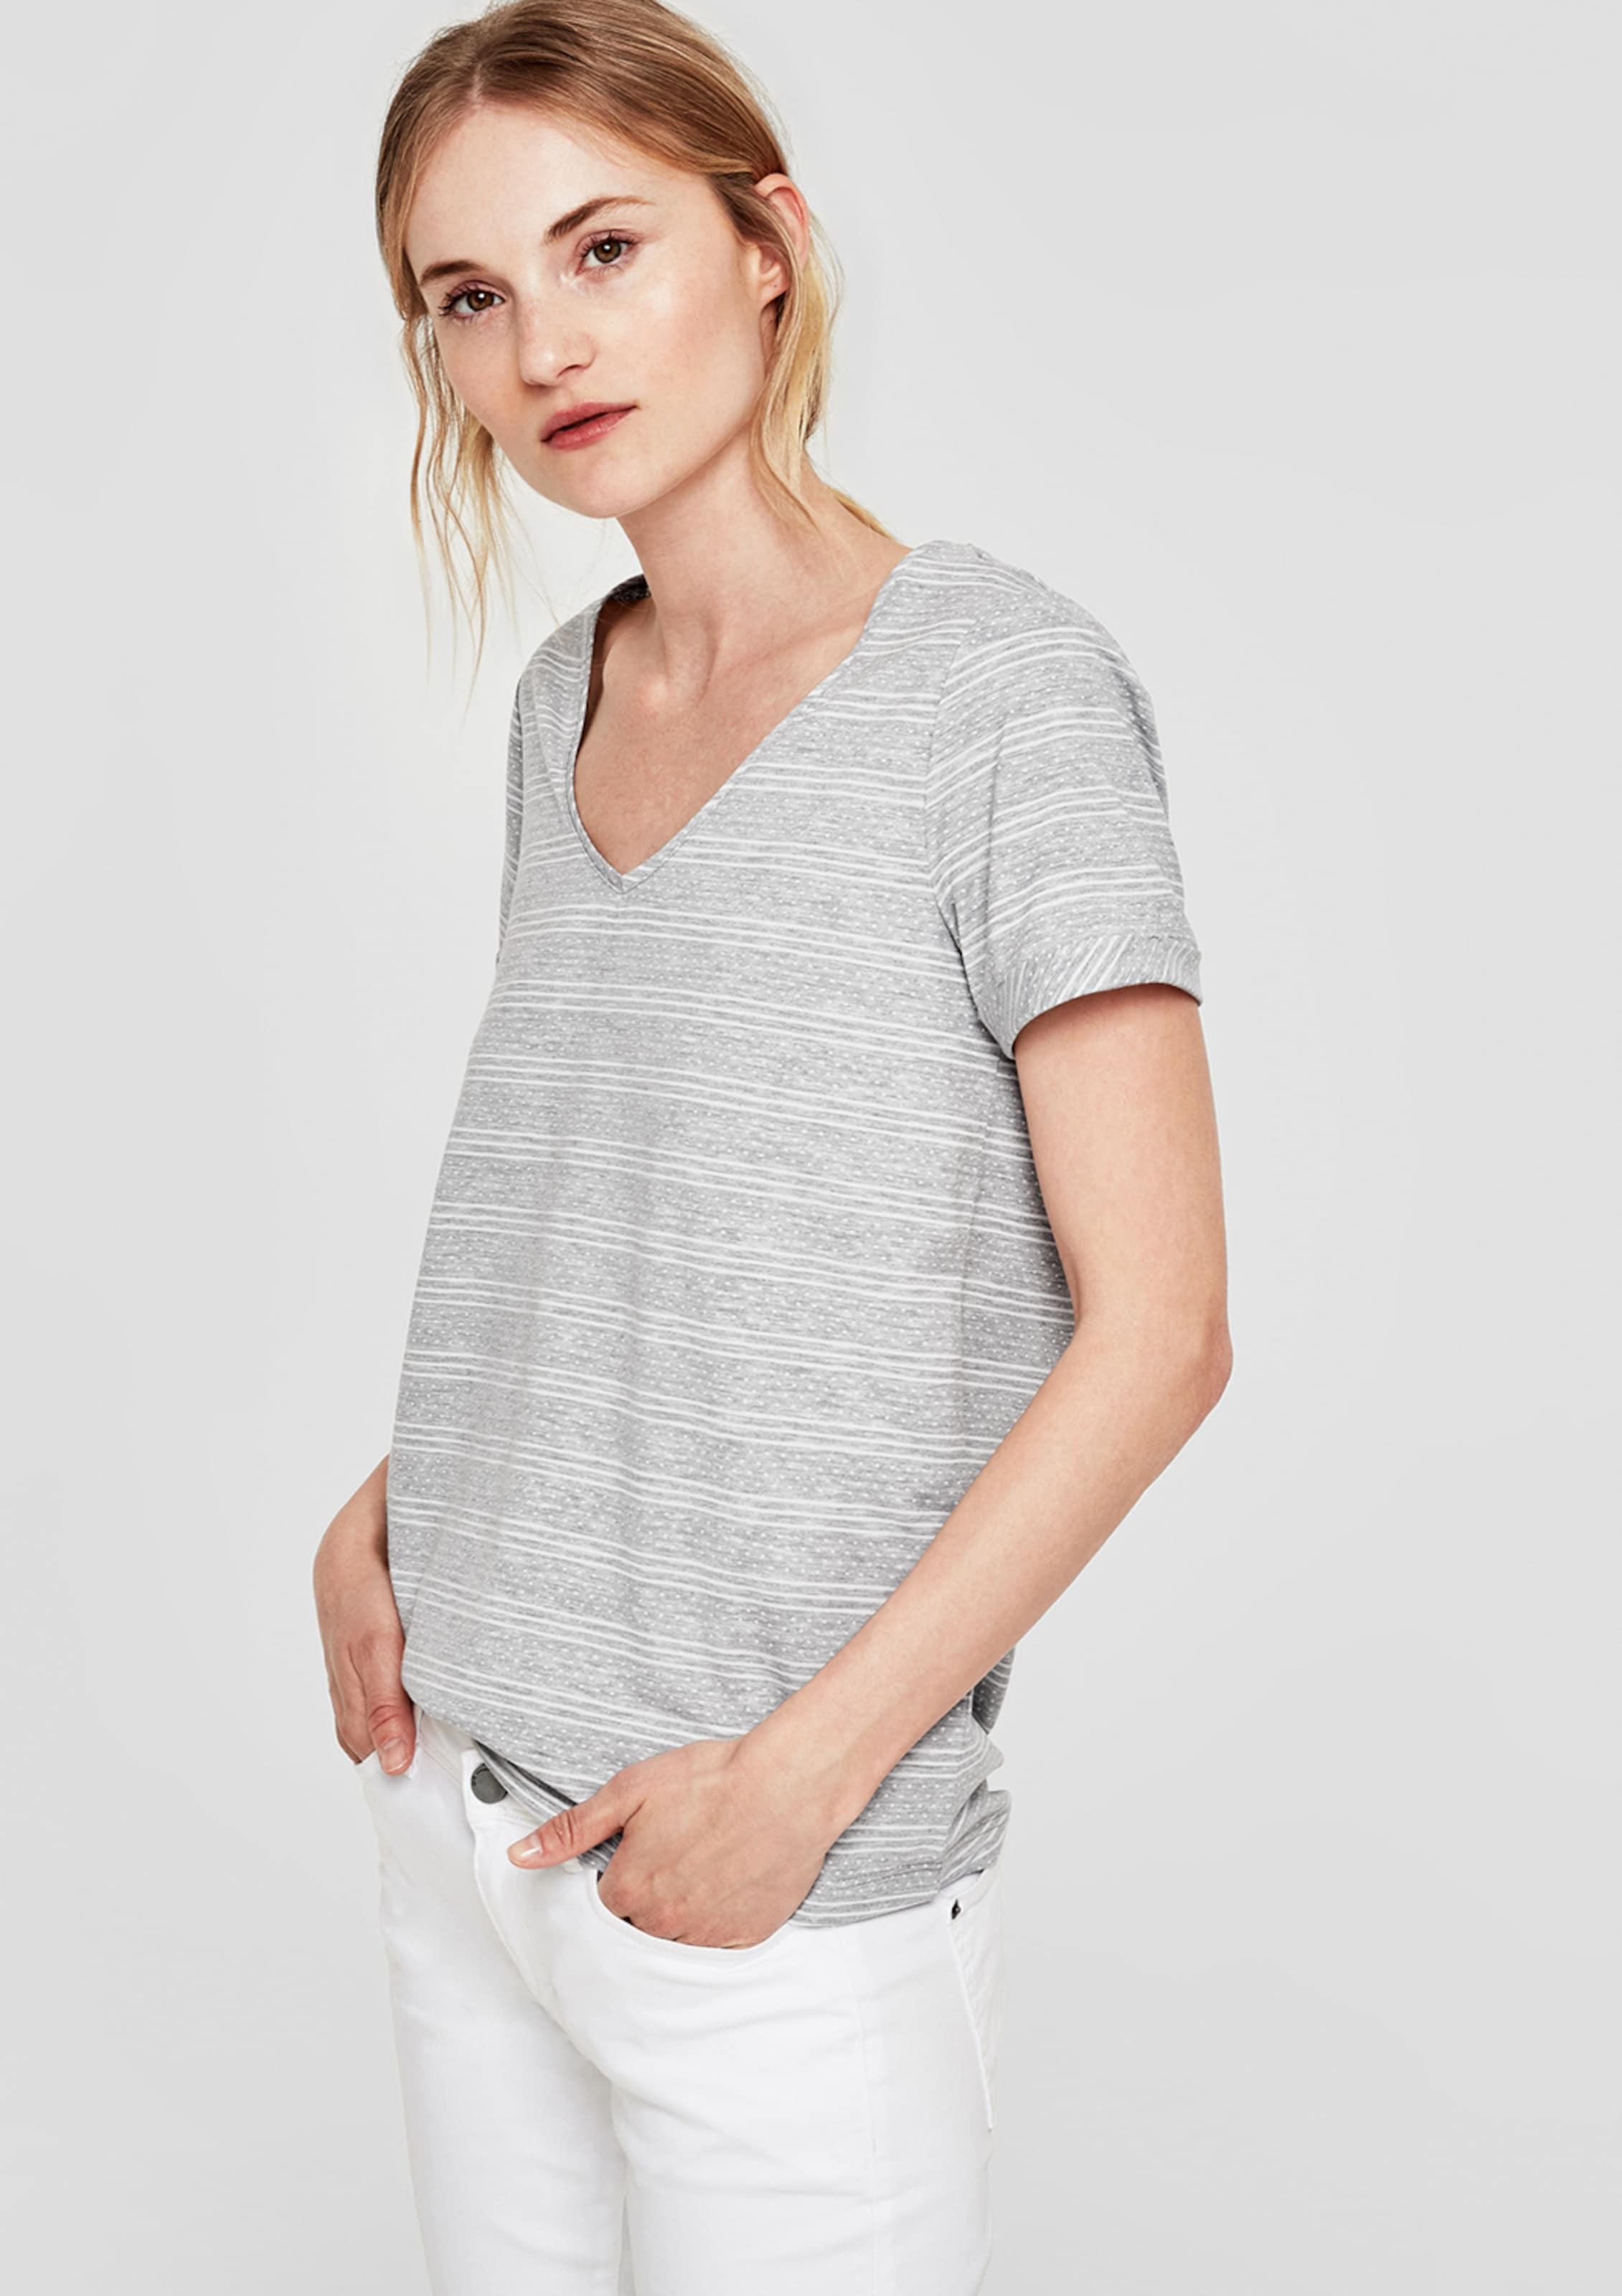 In oliver S Shirt oliver In Shirt oliver S In S Shirt GraumeliertWeiß GraumeliertWeiß 53RjAq4L